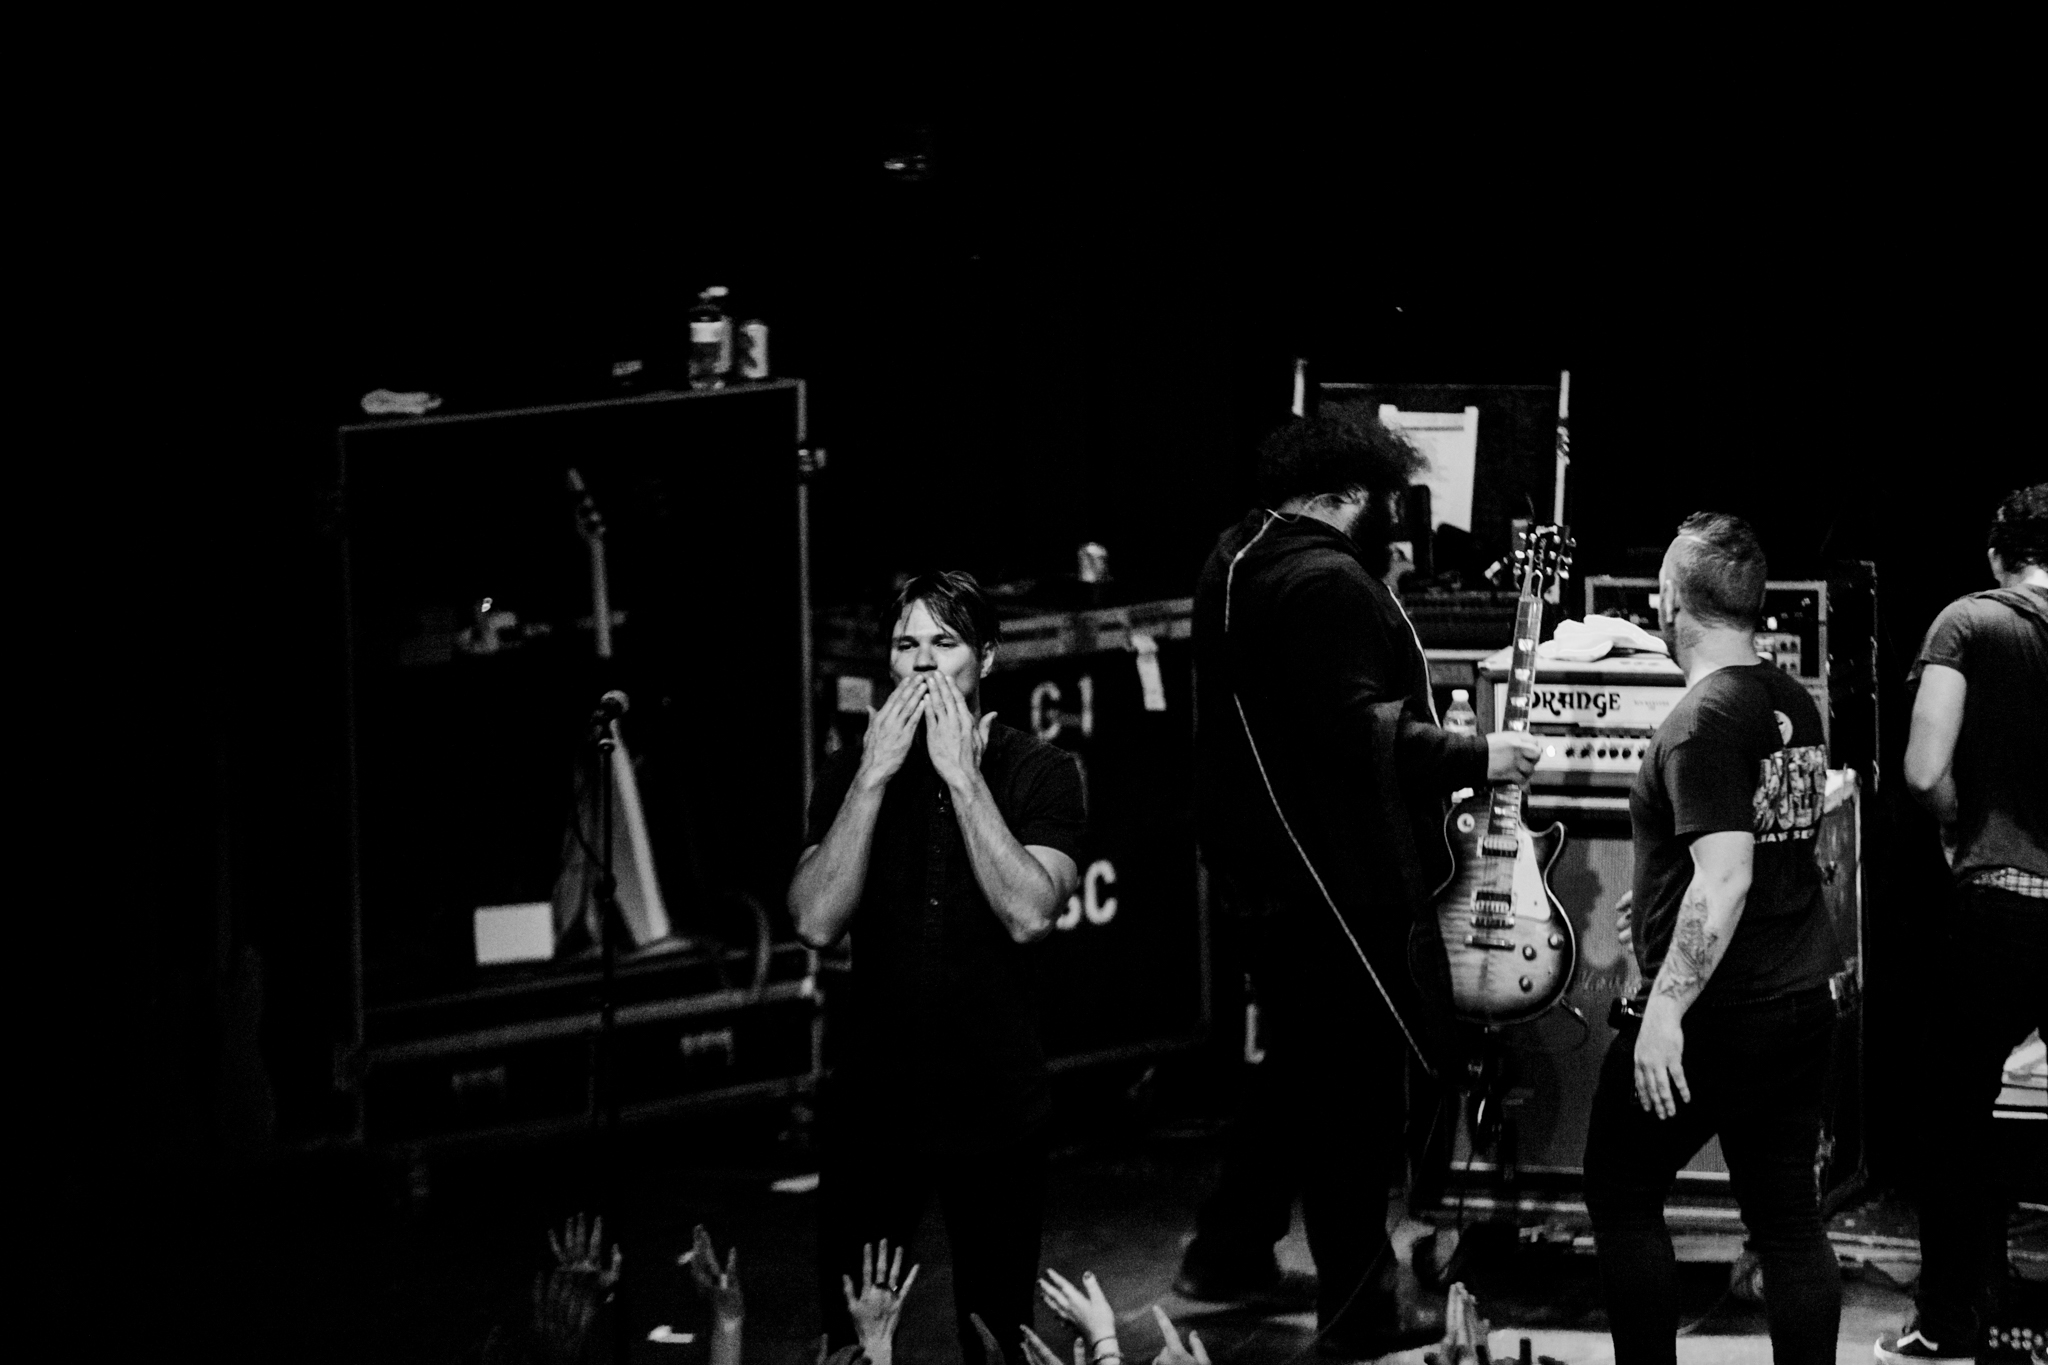 Lafferty Photo - Dance Gavin Dance 03.08.17-8888.jpg